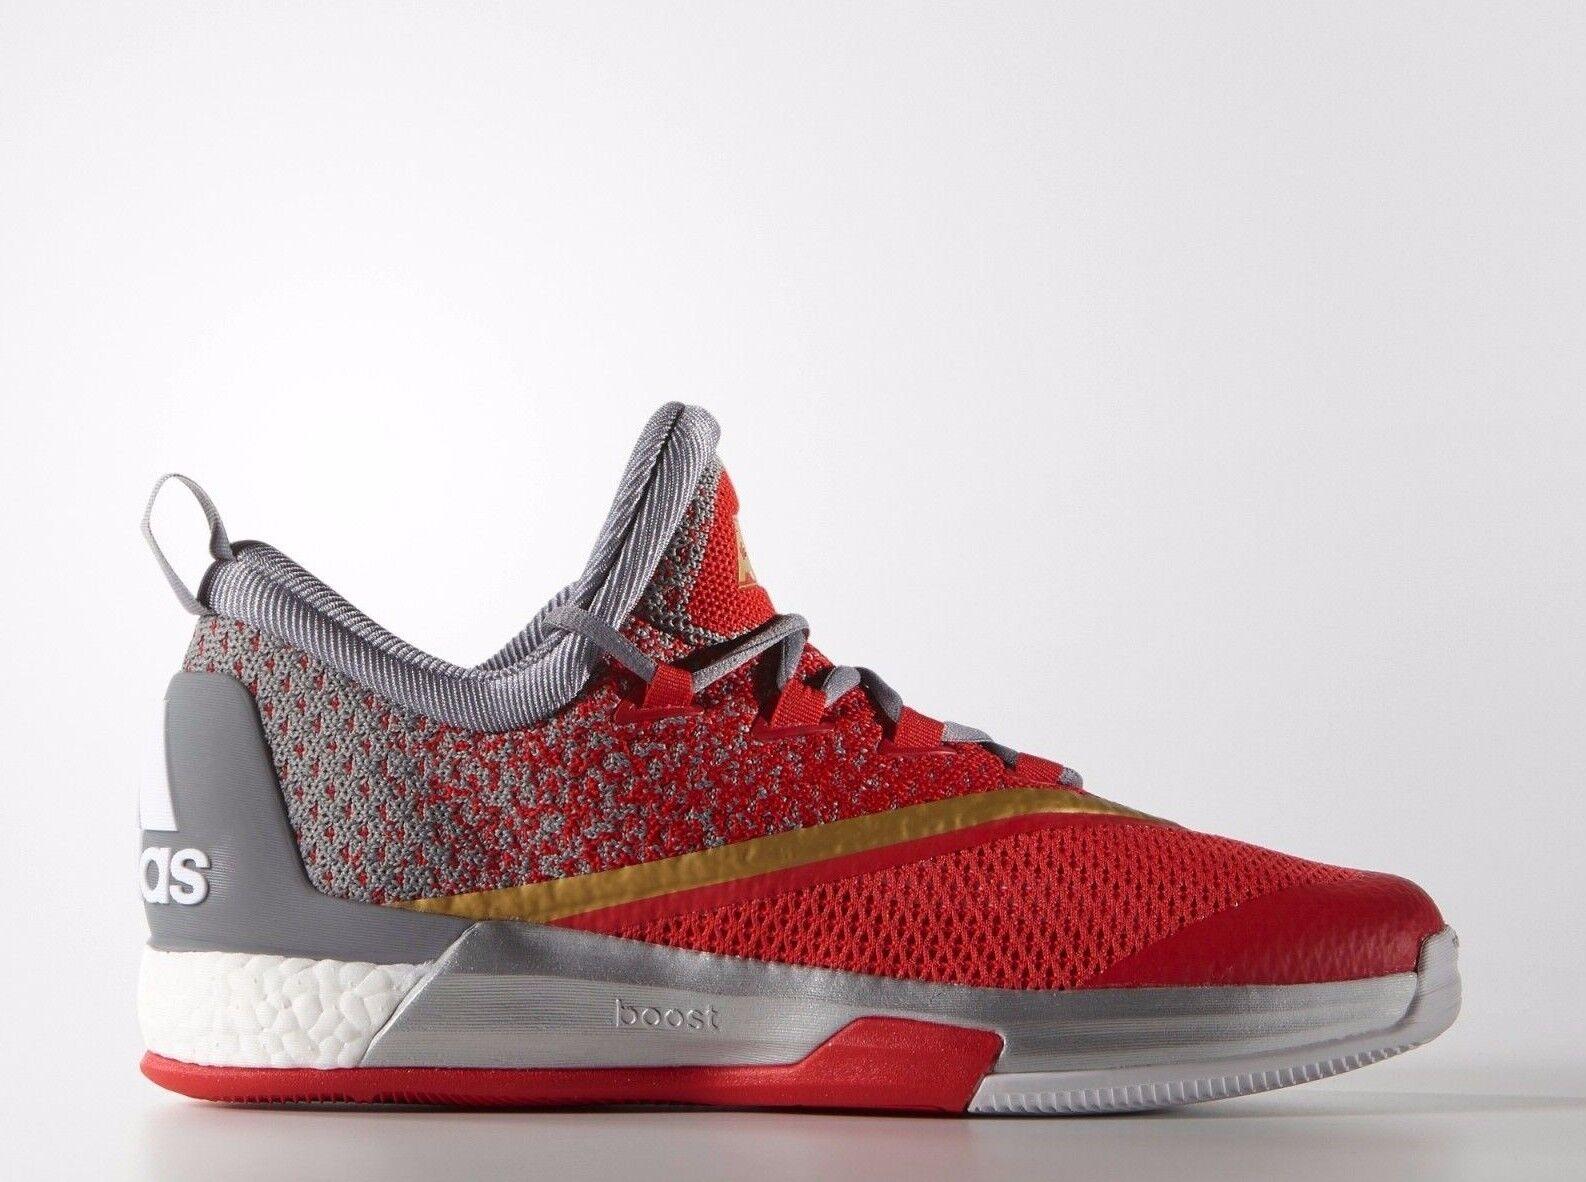 Adidas Crazylight Boost 2.5 Uomo Basketball Shoes White/Grey/Vivid Red AQ8468